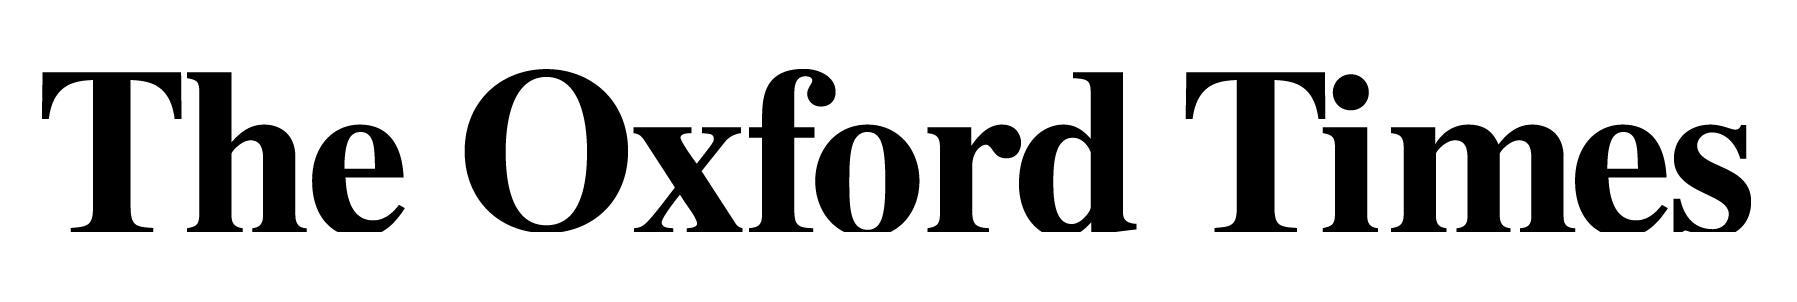 Oxford-Times-mast-mono